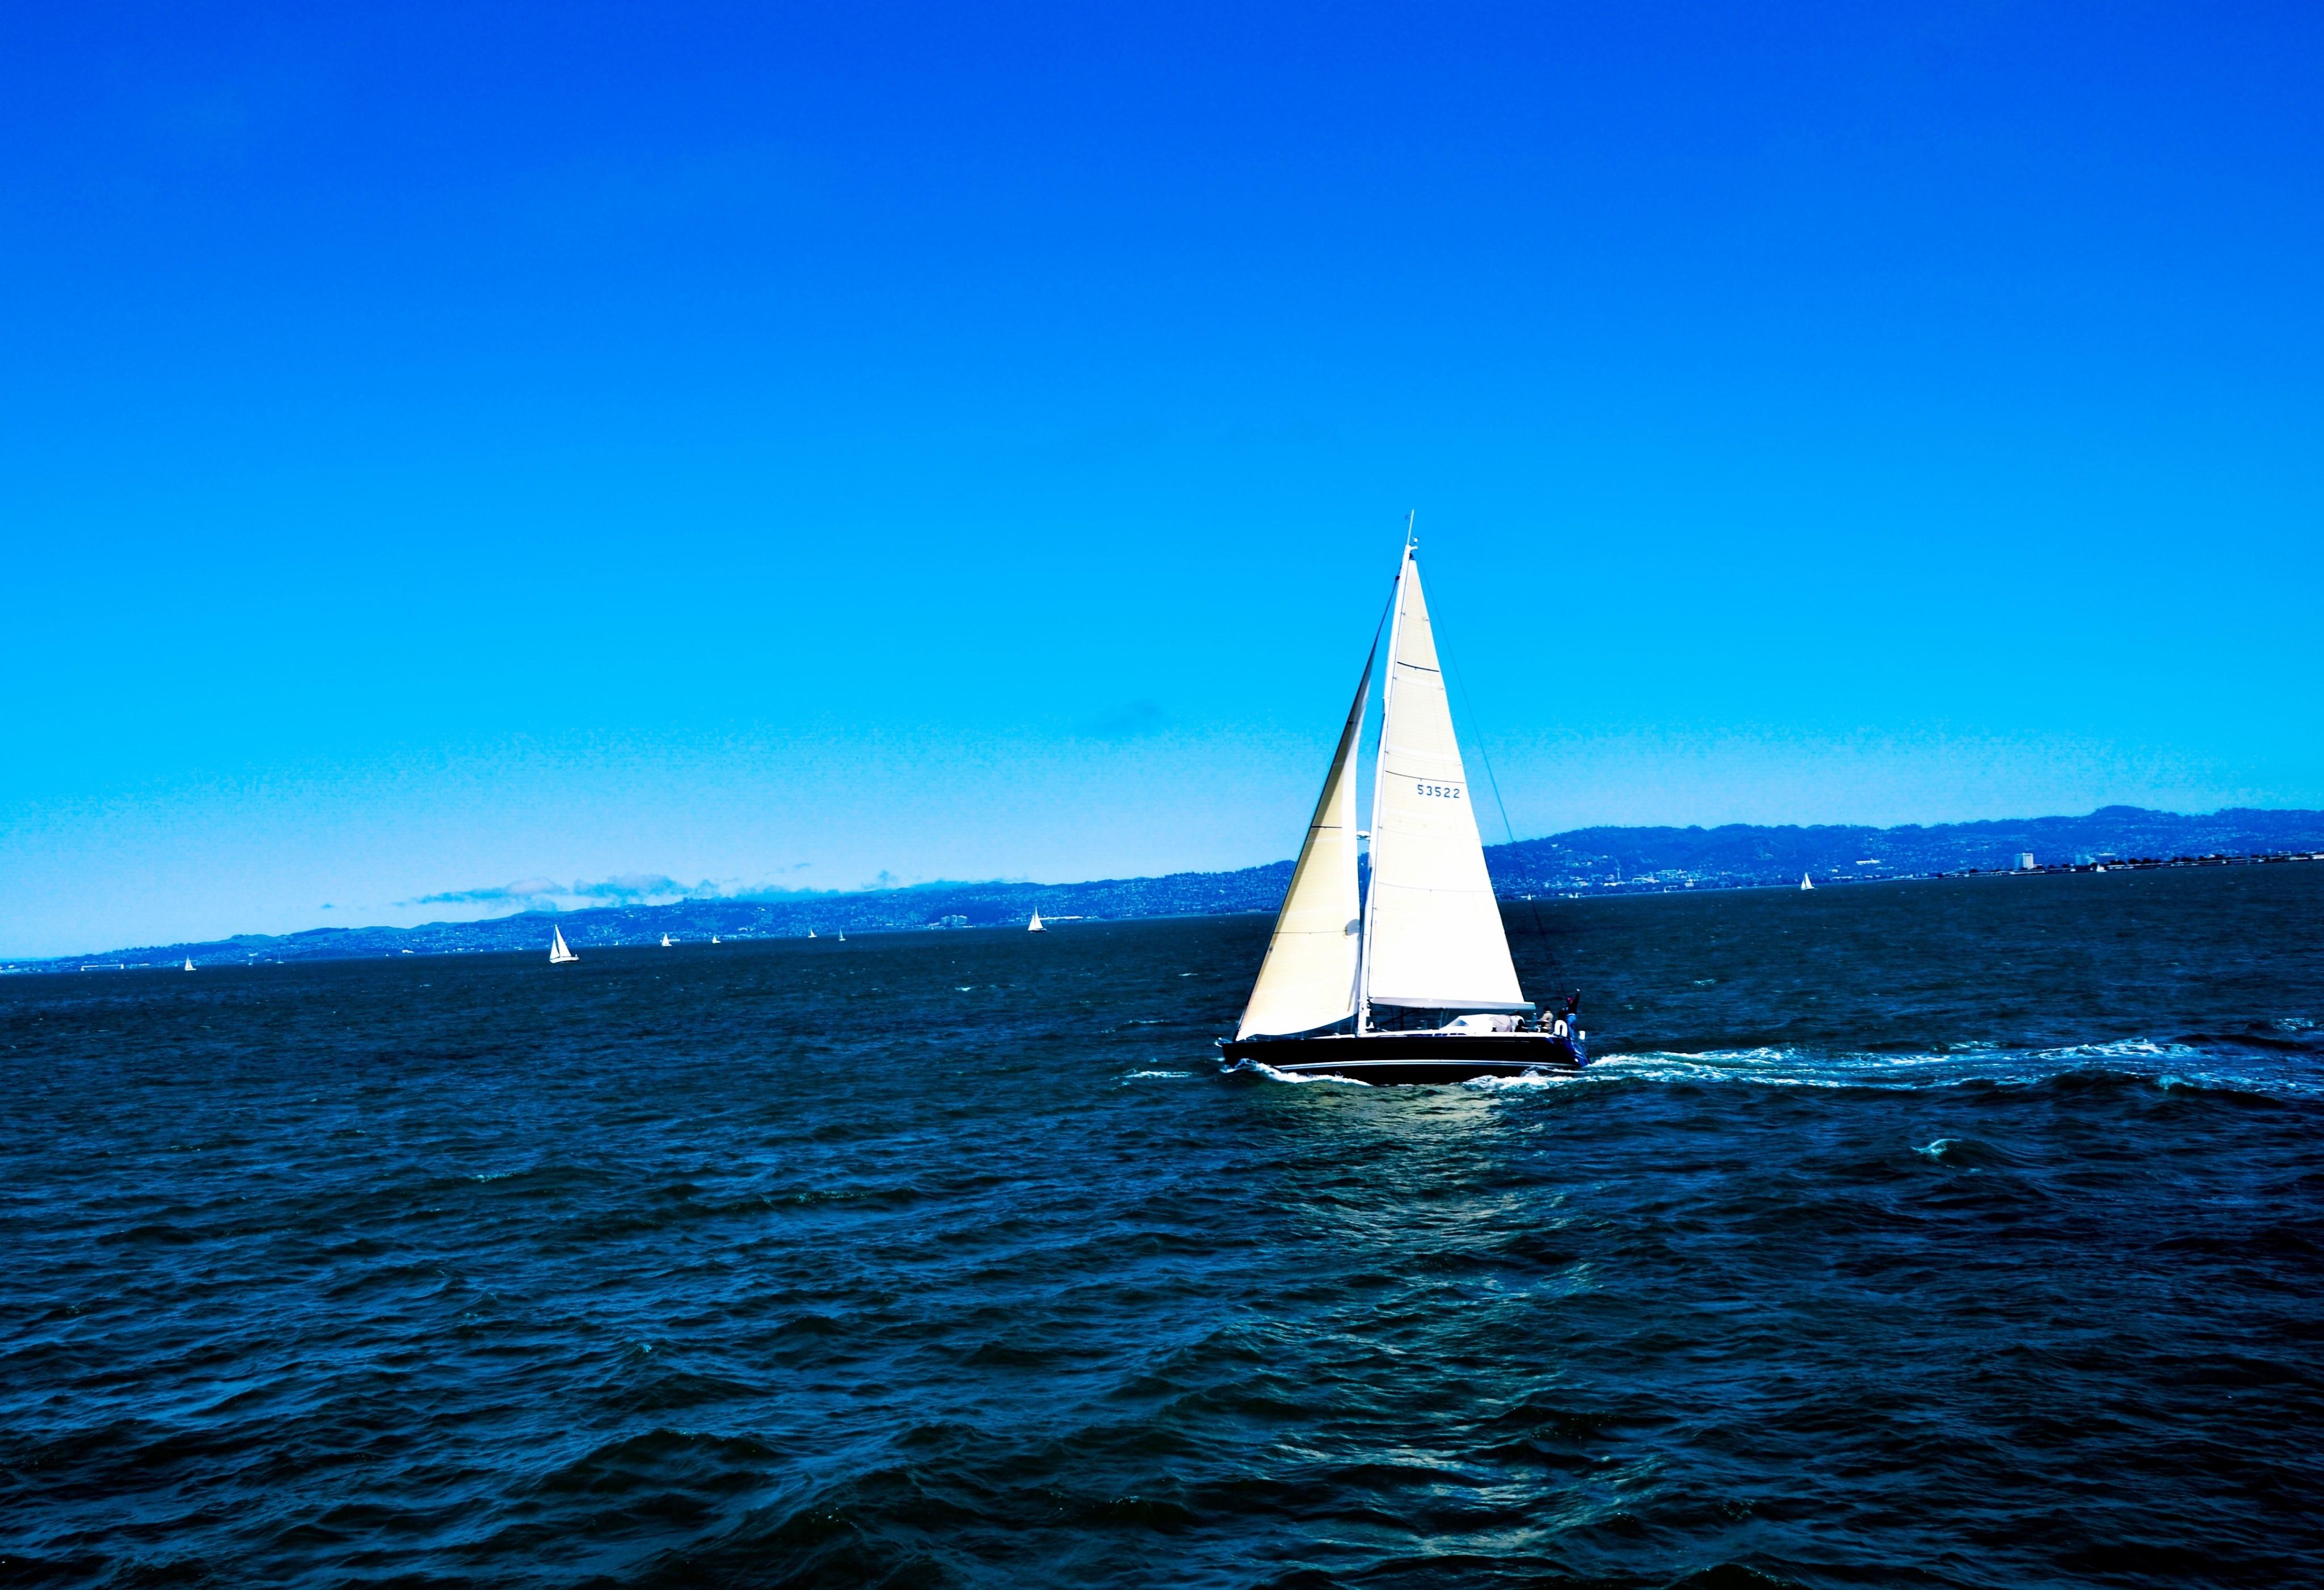 Sailboat 4k Ultra HD Wallpaper